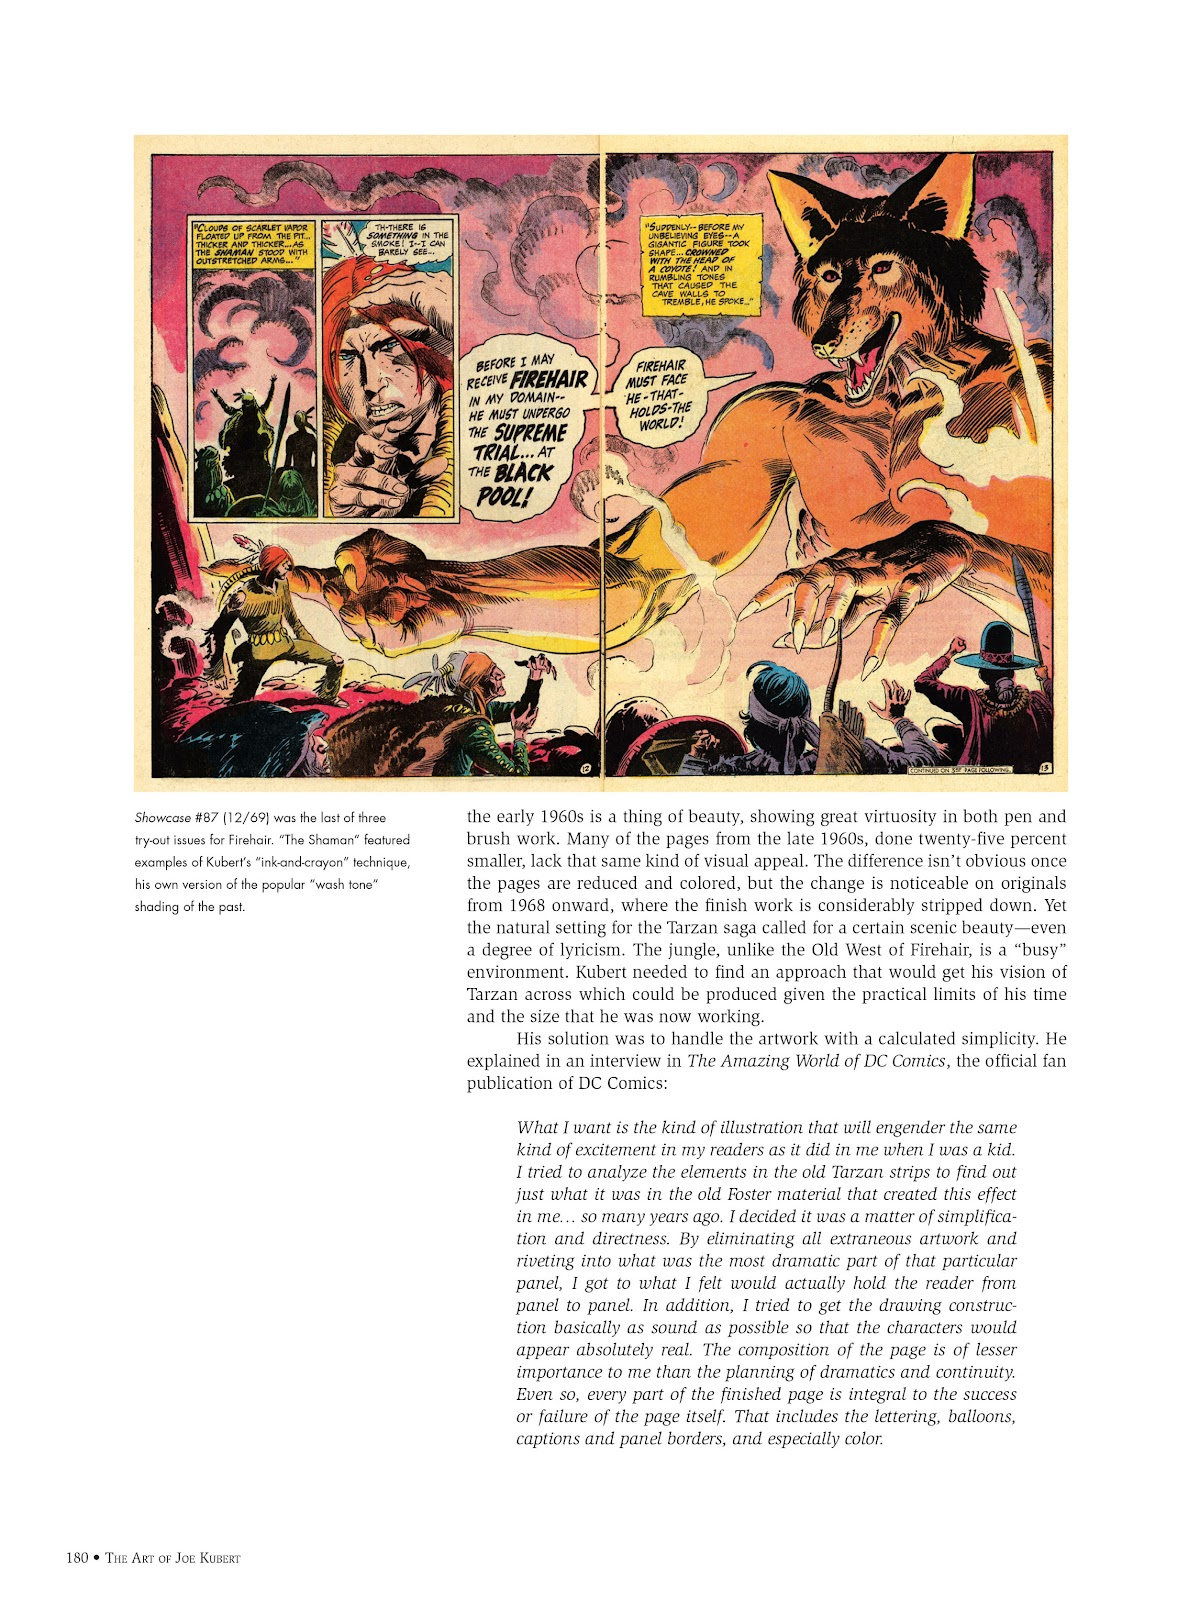 Read online The Art of Joe Kubert comic -  Issue # TPB (Part 2) - 80